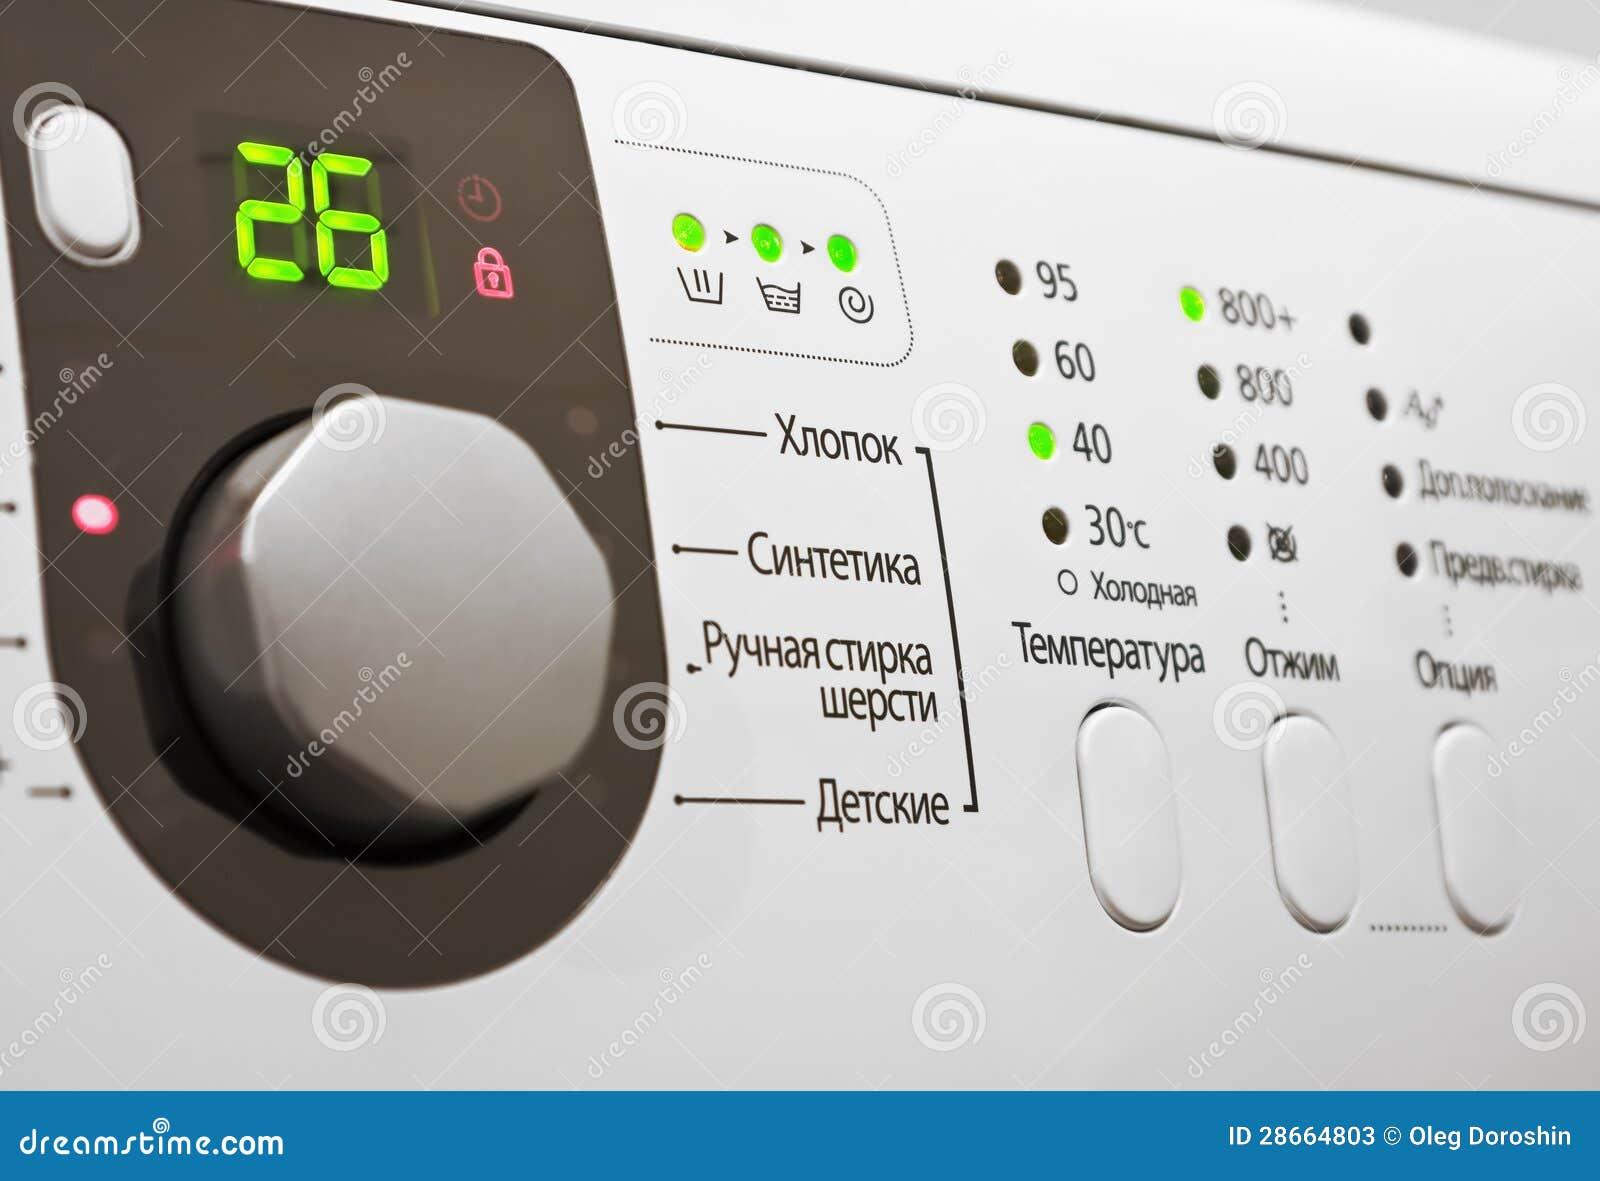 Washing Machine Controls : Control panel of white washing machine stock photos